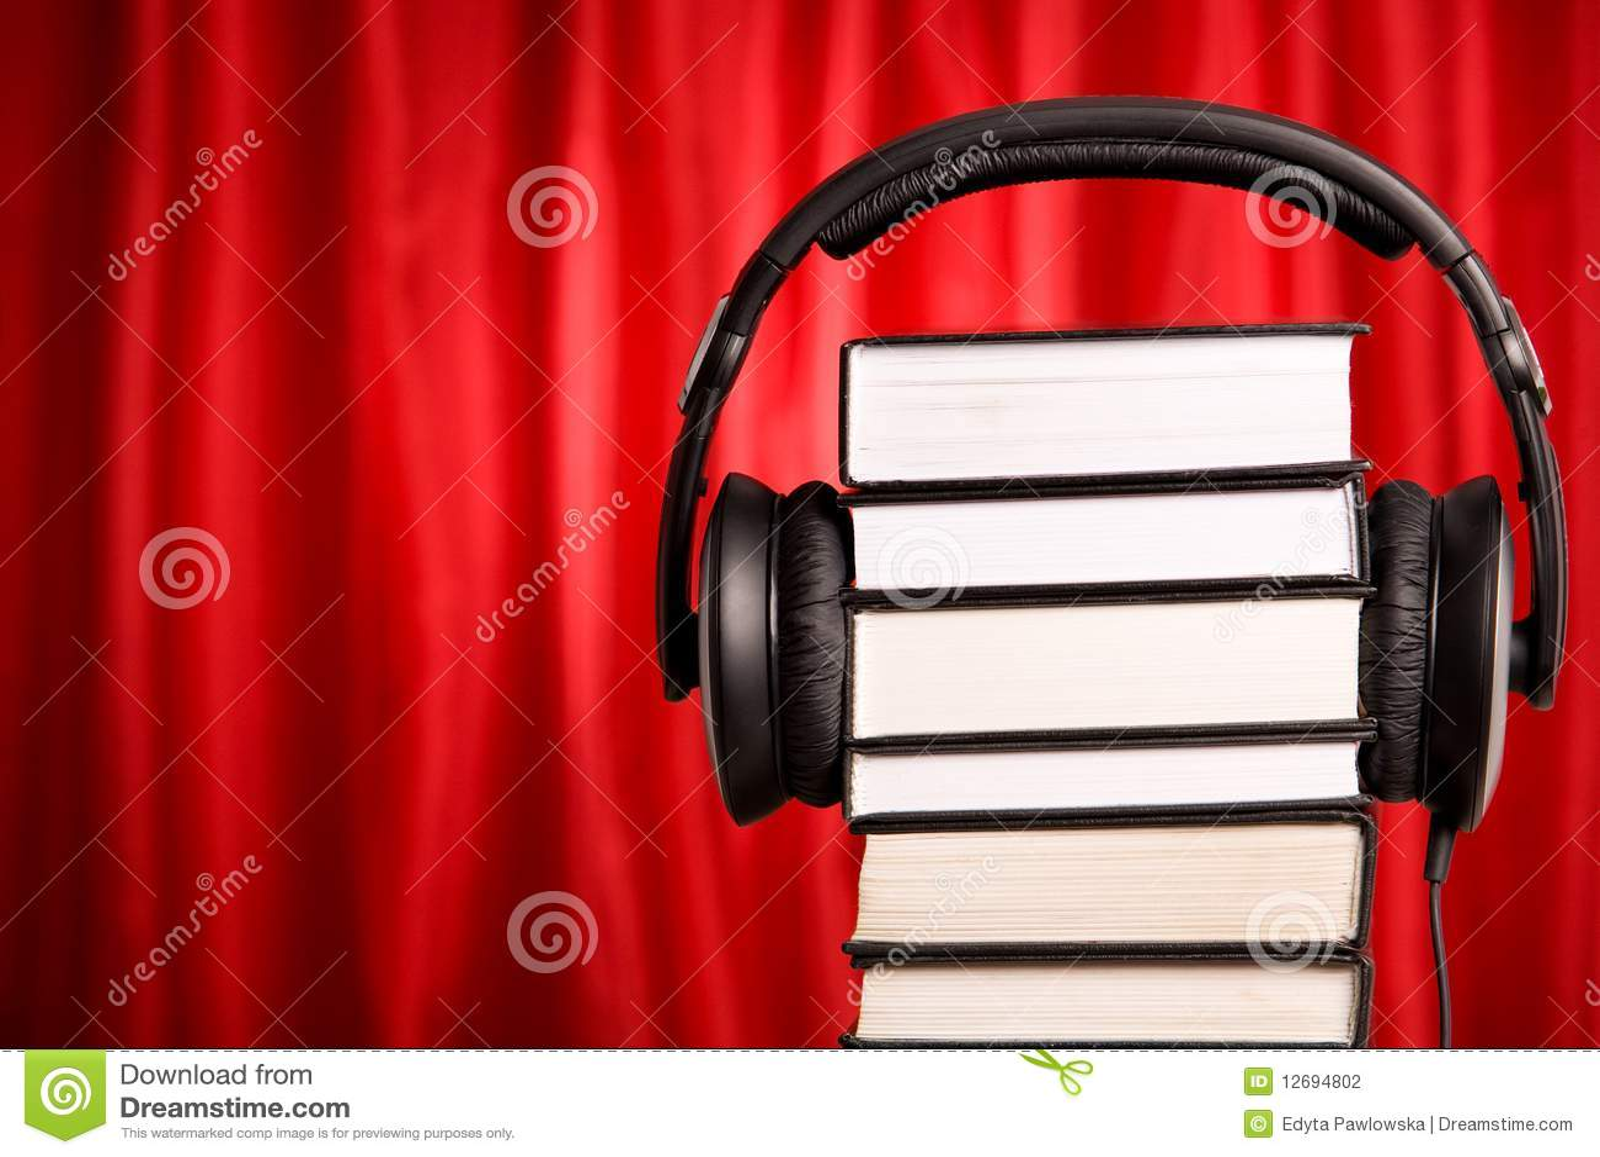 audio books second grade - 970×546